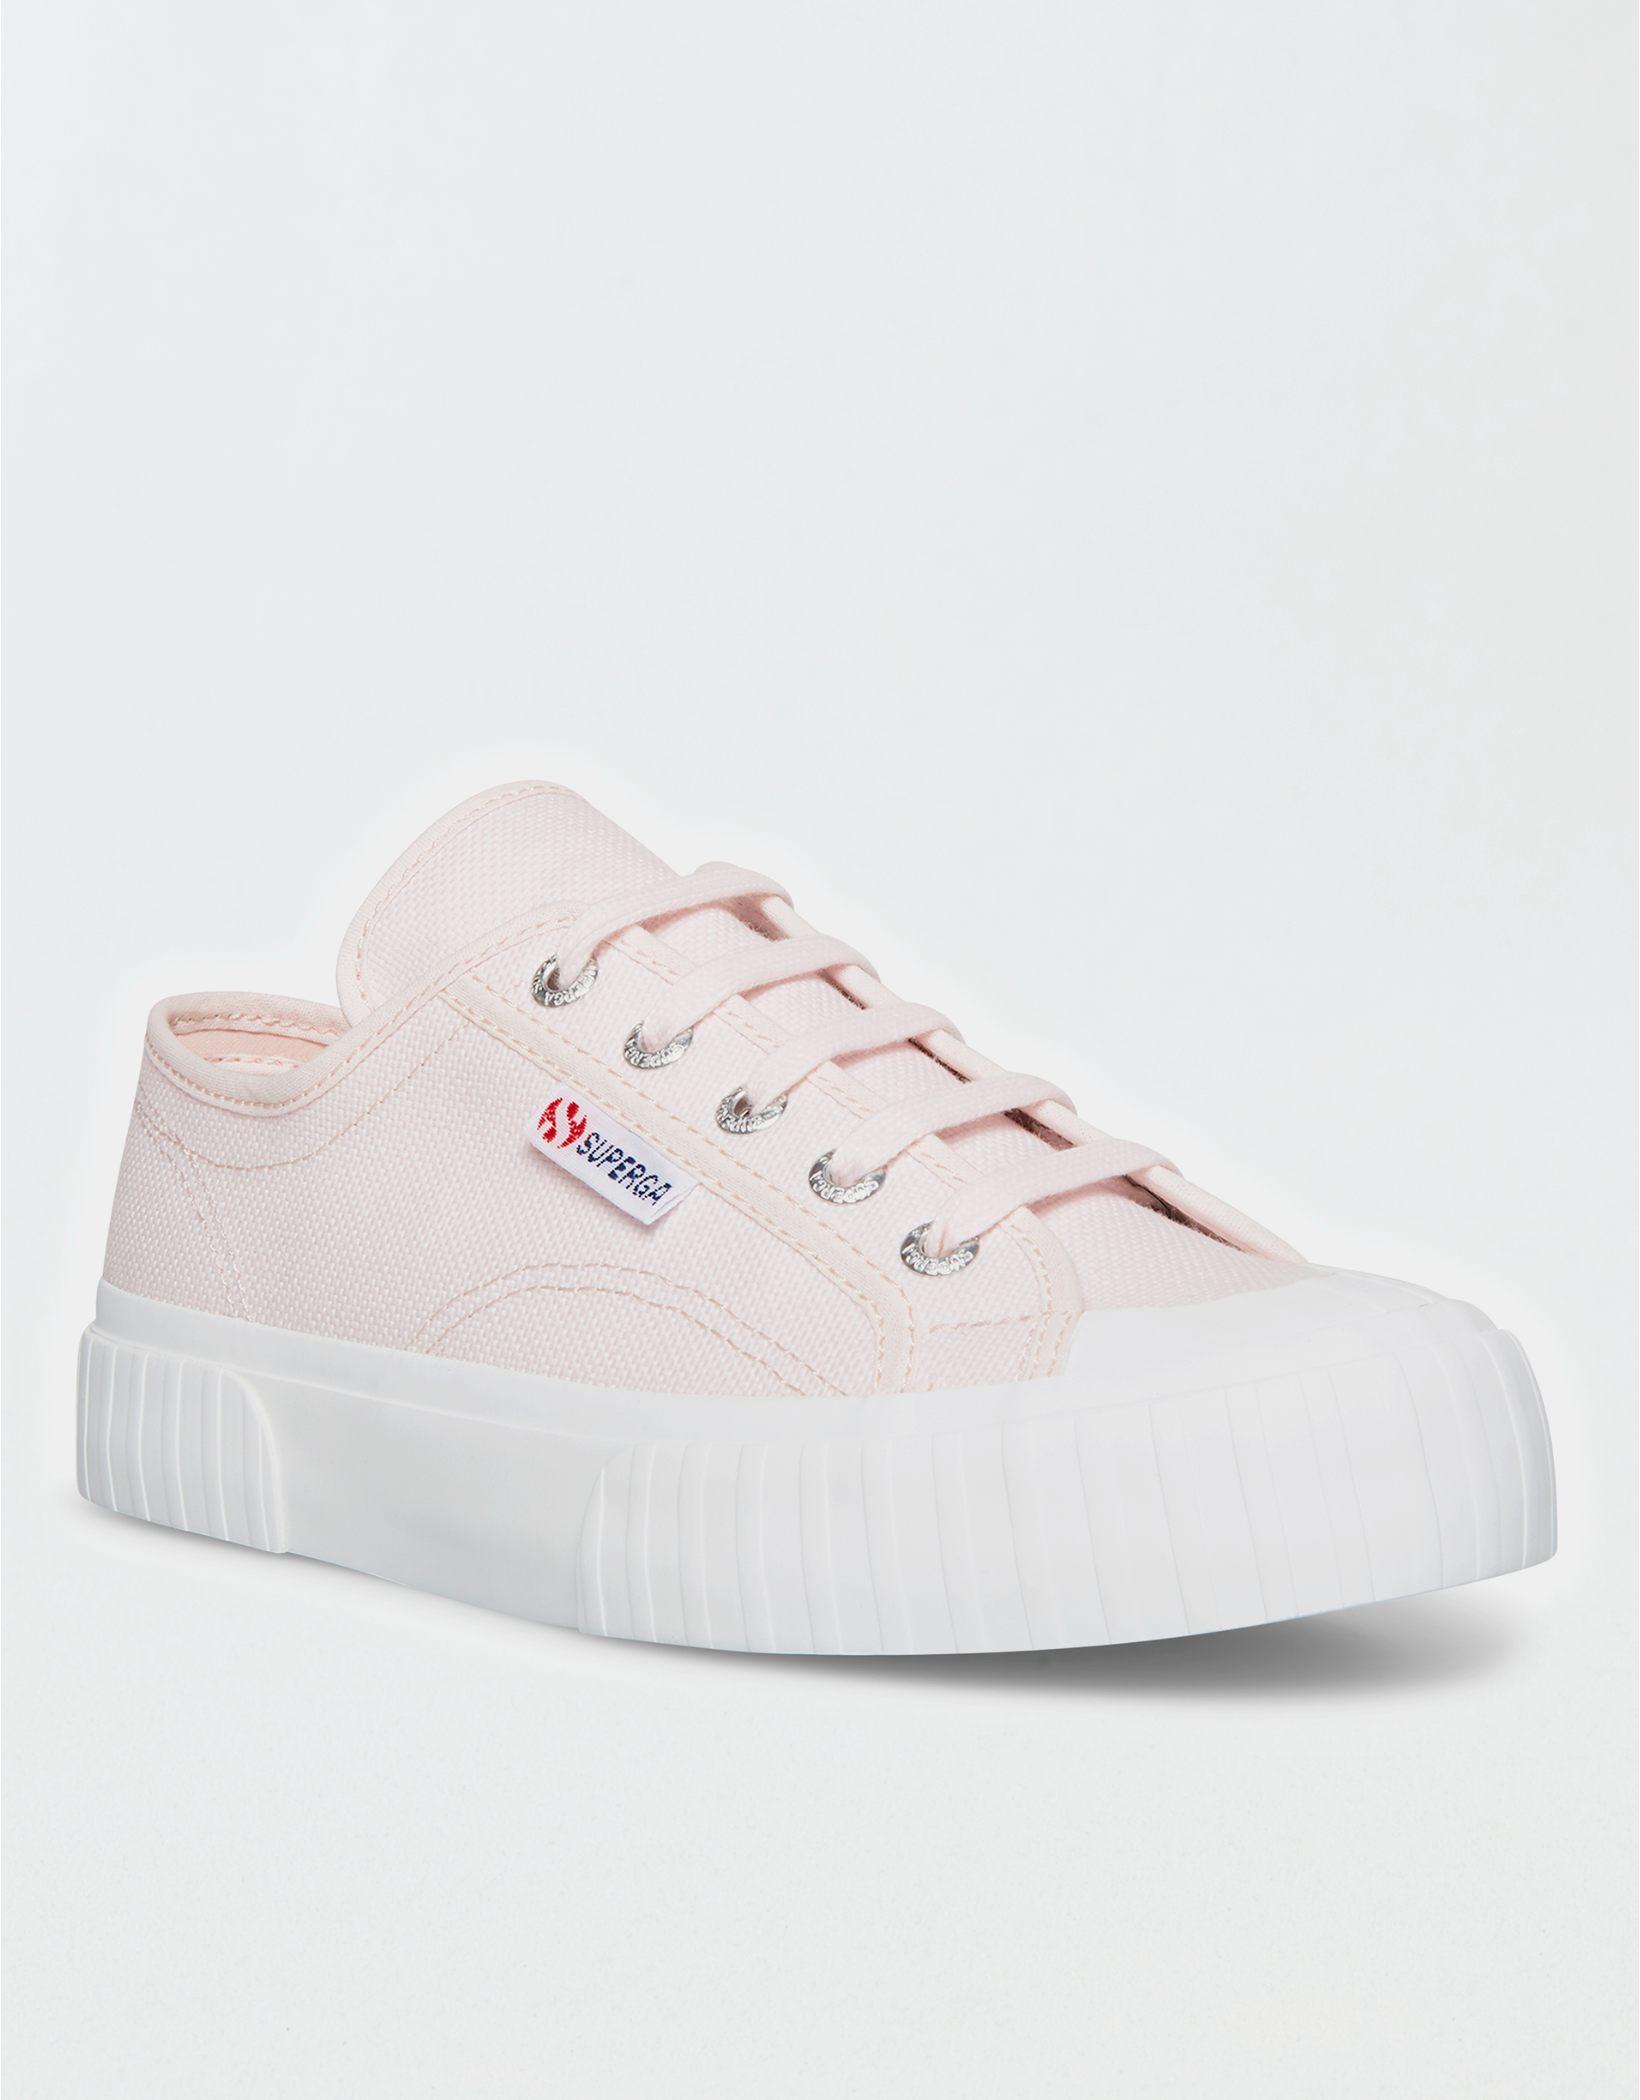 Superga 2630 Stripe Sneaker